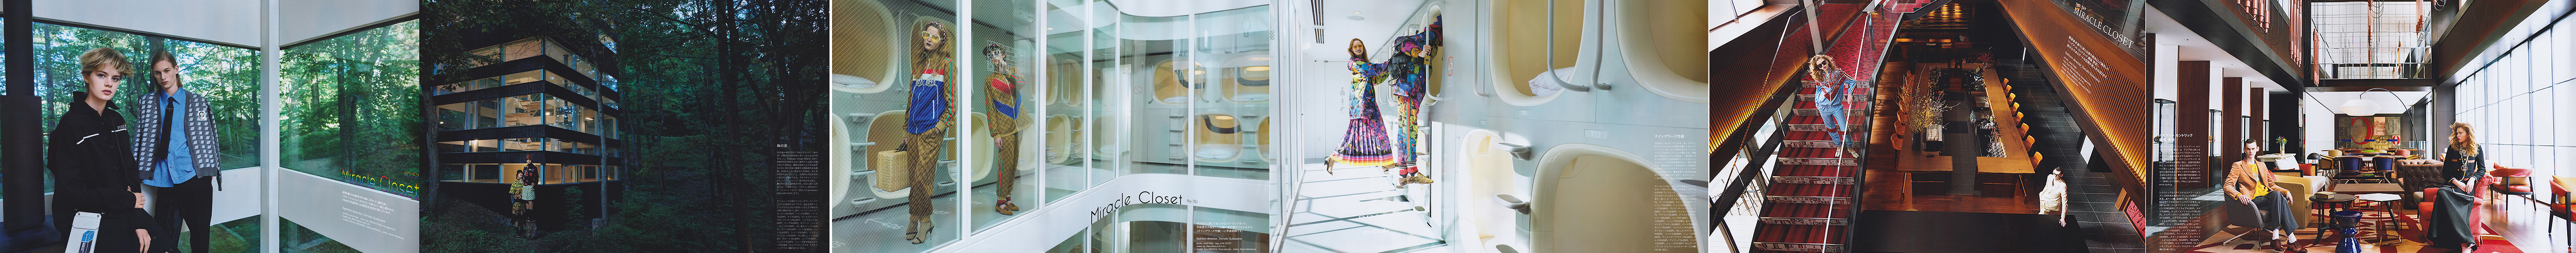 Casa BRUTUS _Miracle closet 2018